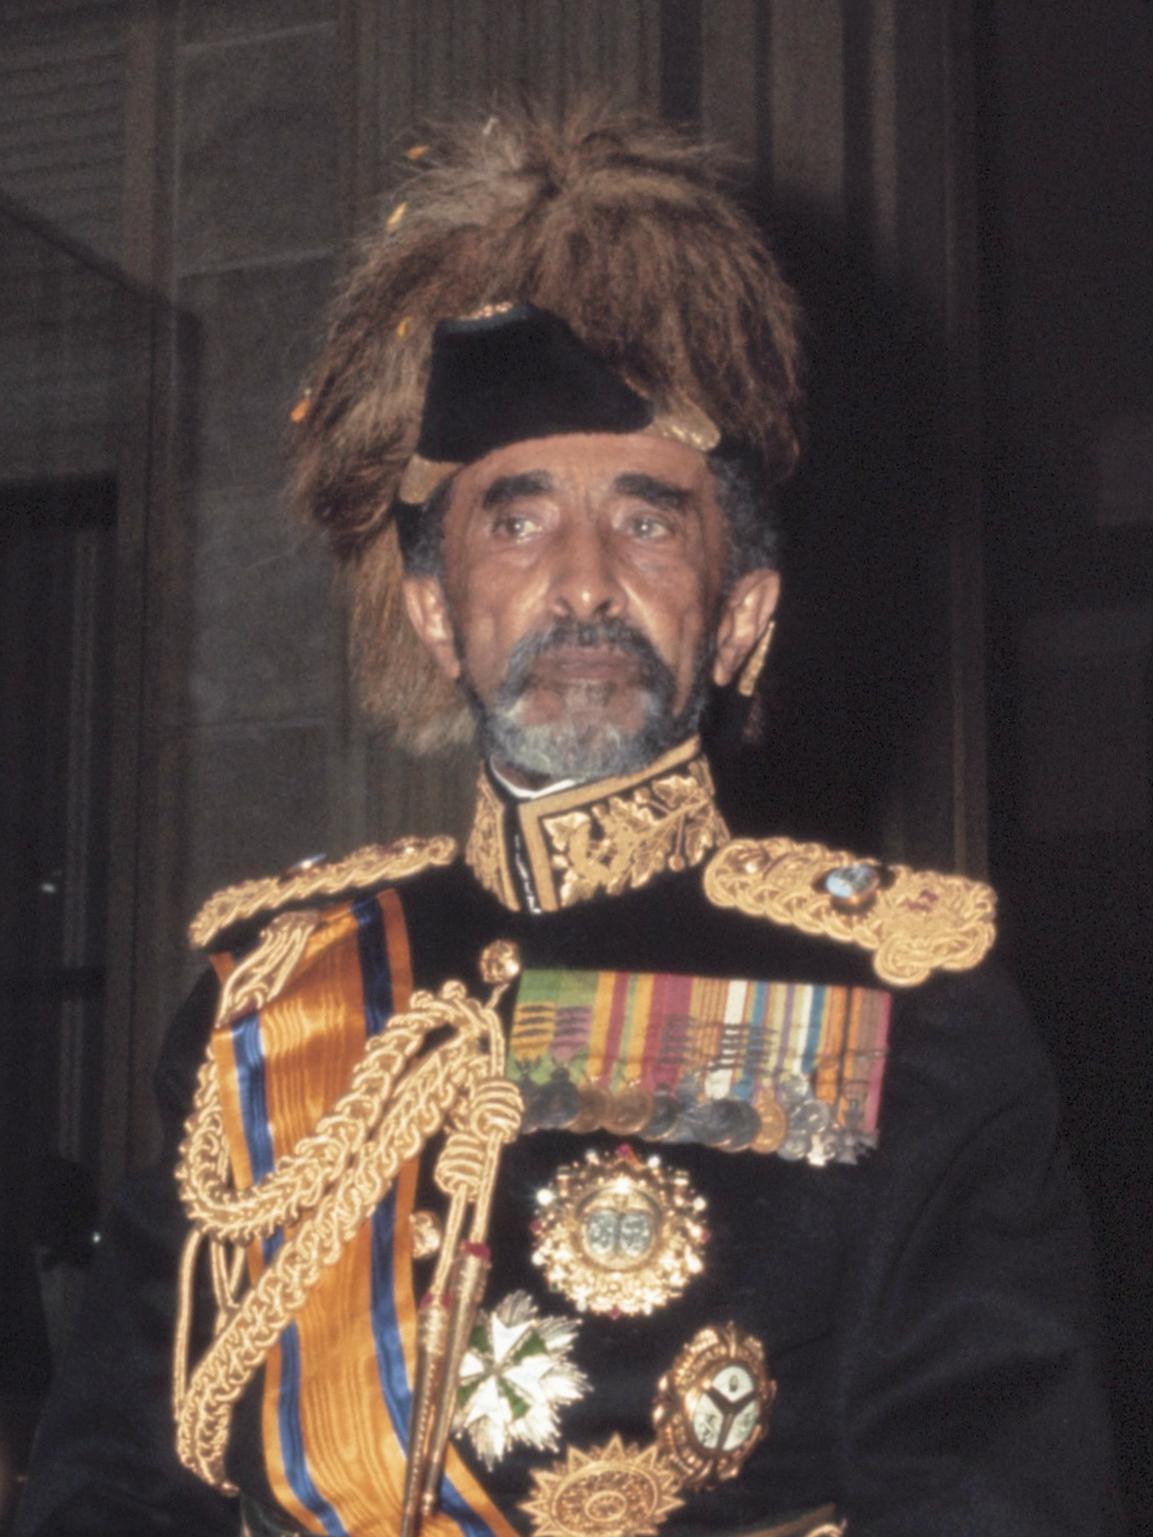 Emperor Haile Selassie Rastafari haile selassie - wikipedia, the free ...